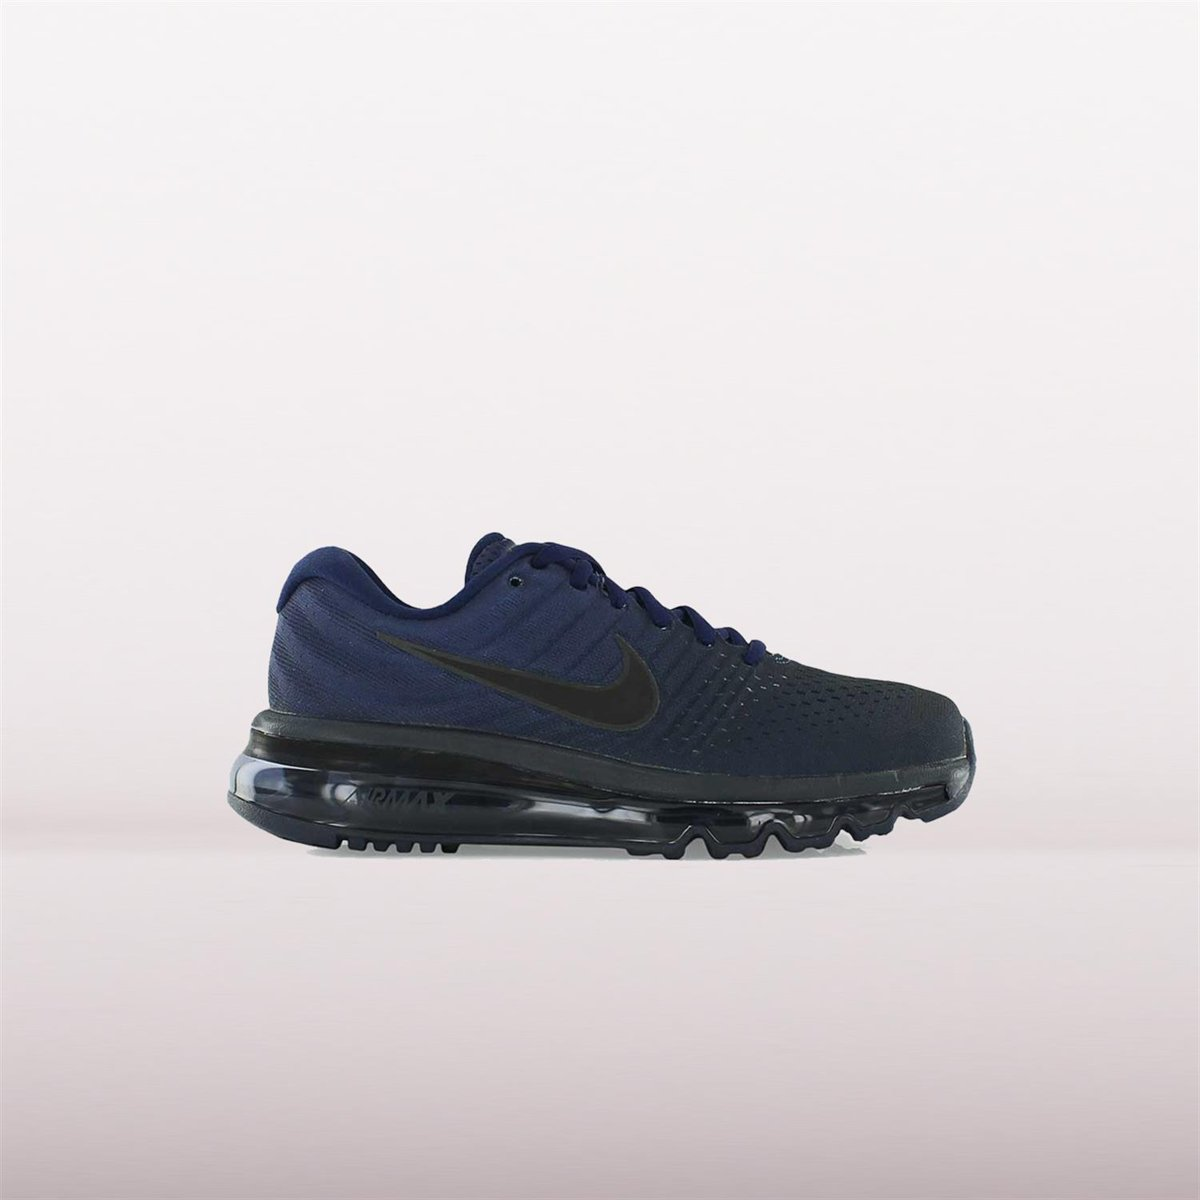 sneakers for cheap 9c802 1c518 bol.com   Nike Air Max 2017 Sneakers Unisex - Binary Blue Black-Obsidian